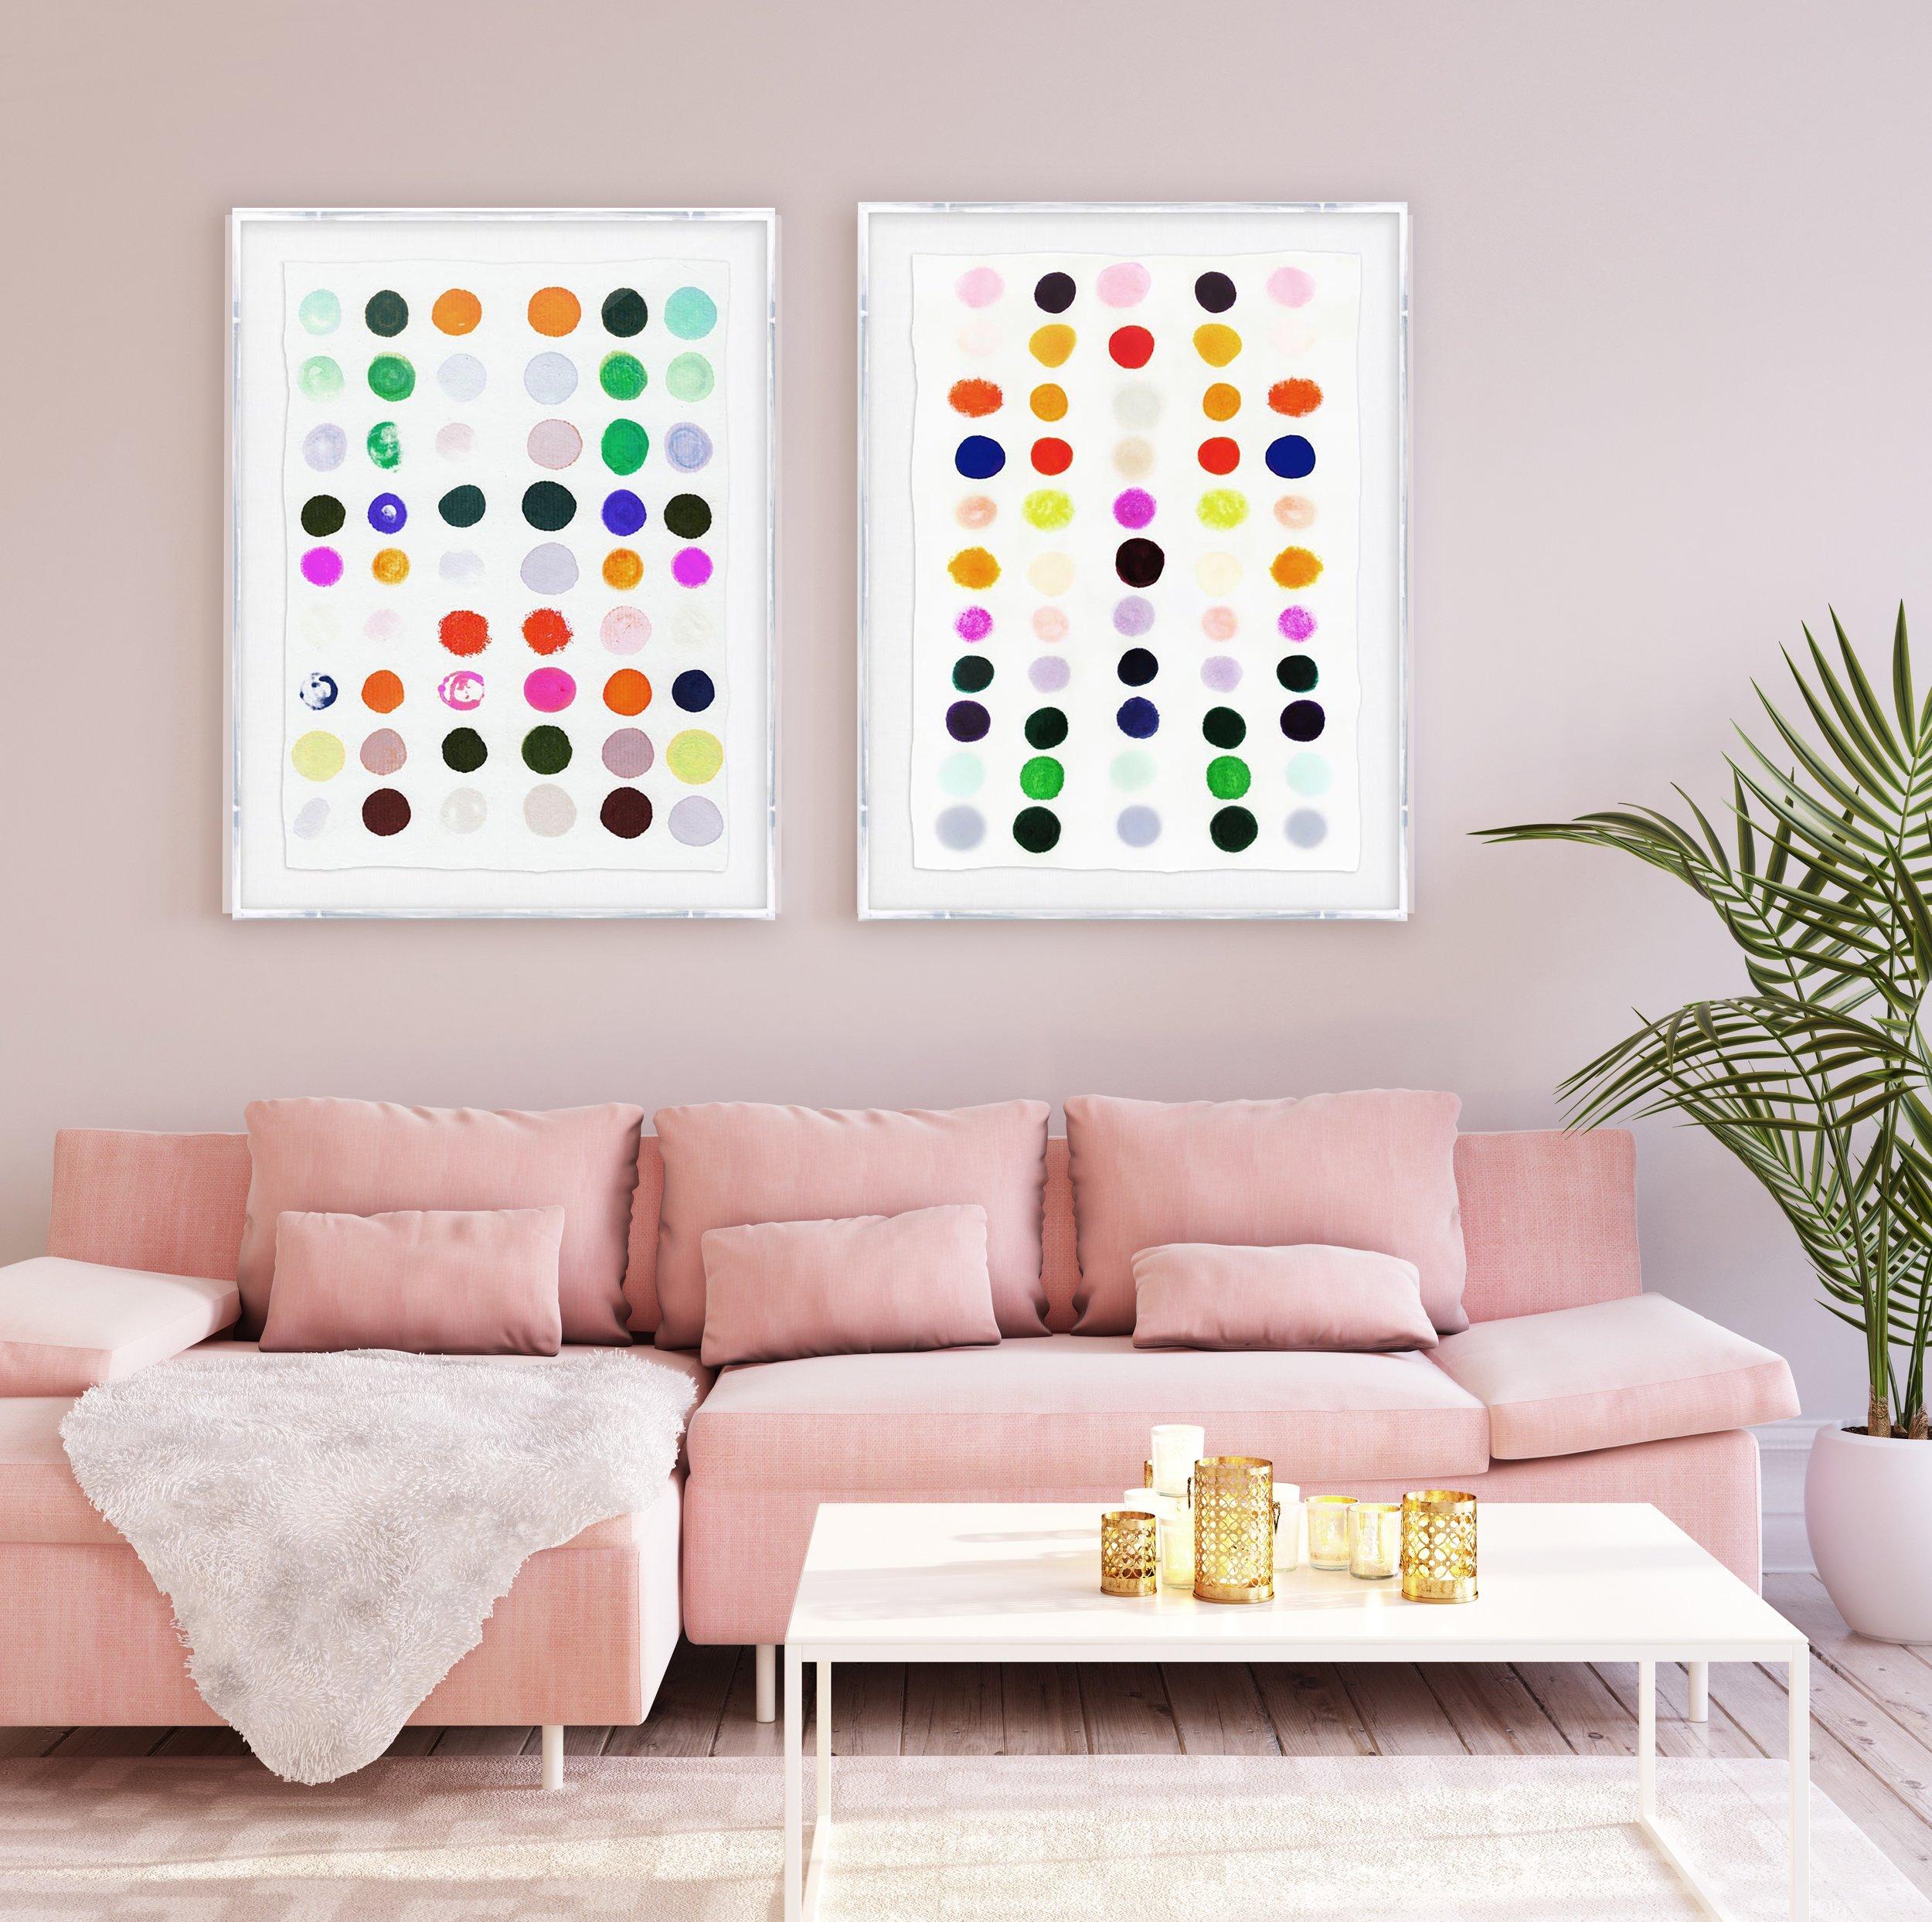 Kristi-Kohut-art-homes-colorful-living-room137.JPG